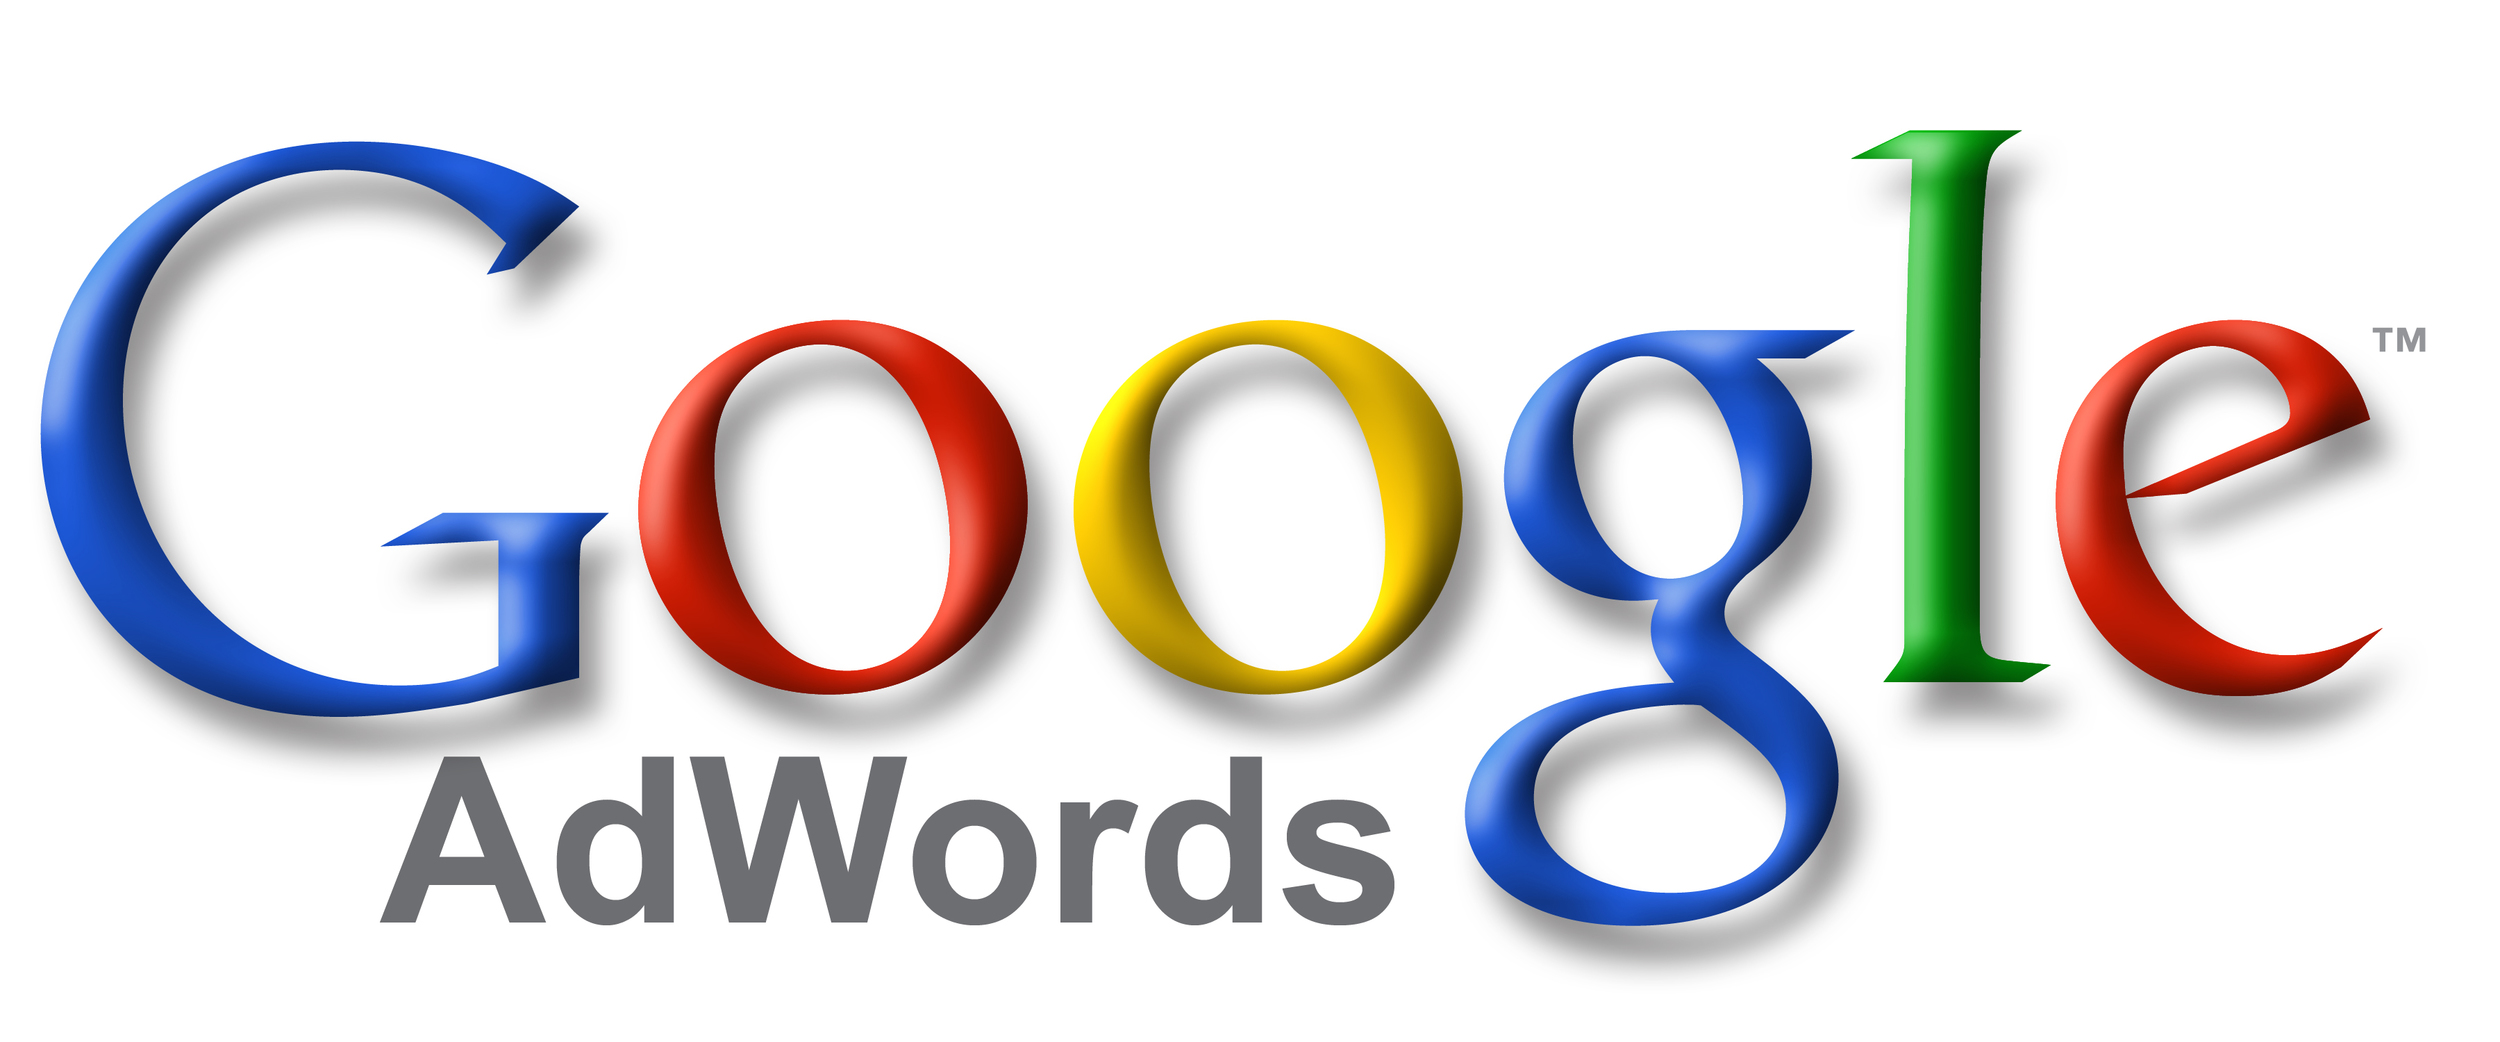 Publicites-google.jpg